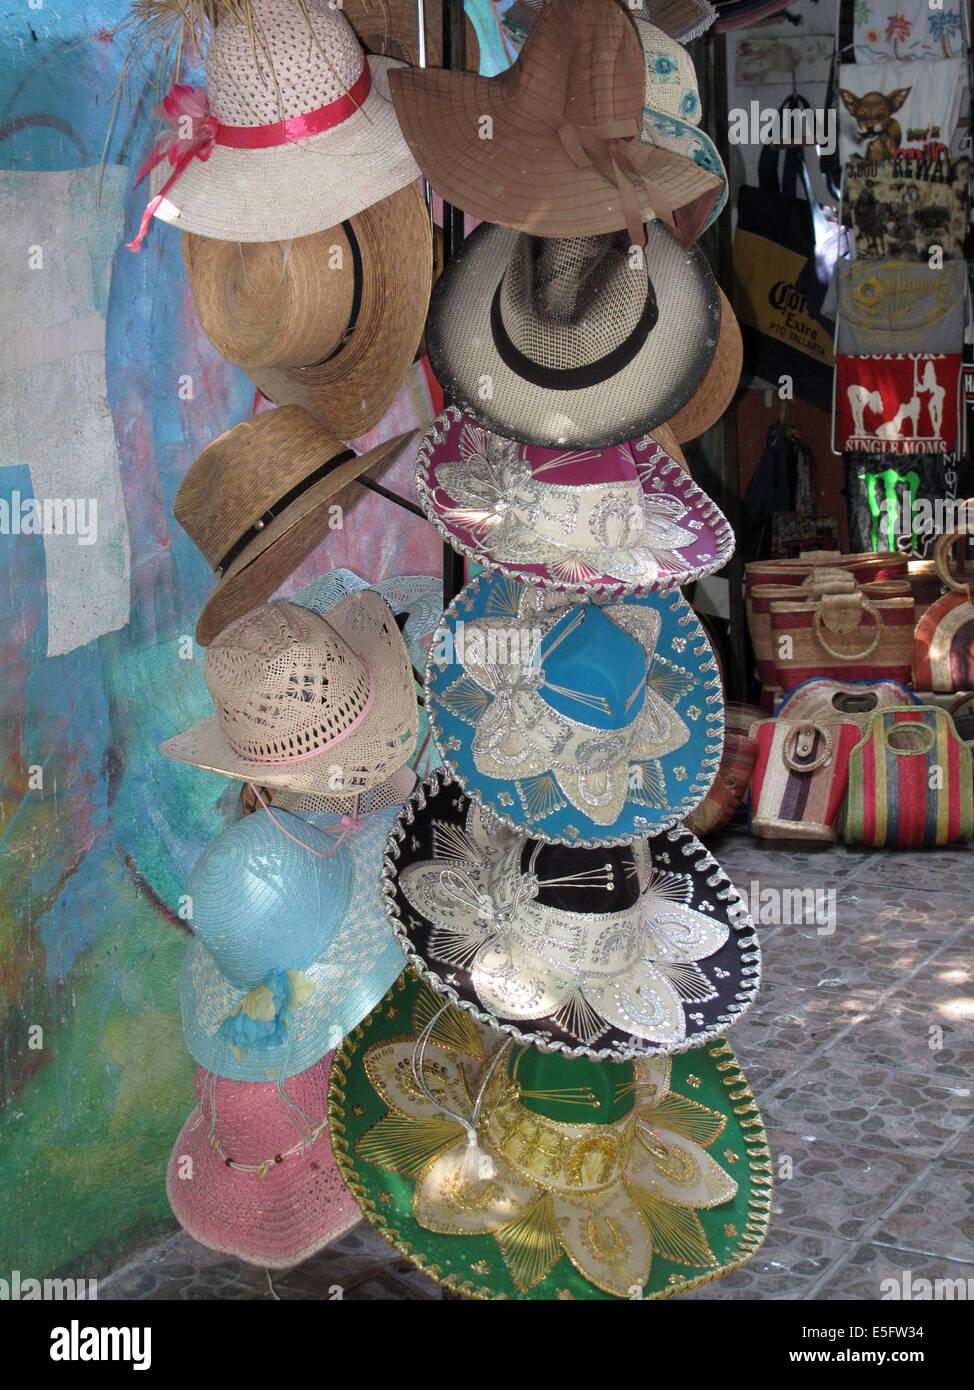 Puerto Vallarta Market, Mexico. - Stock Image